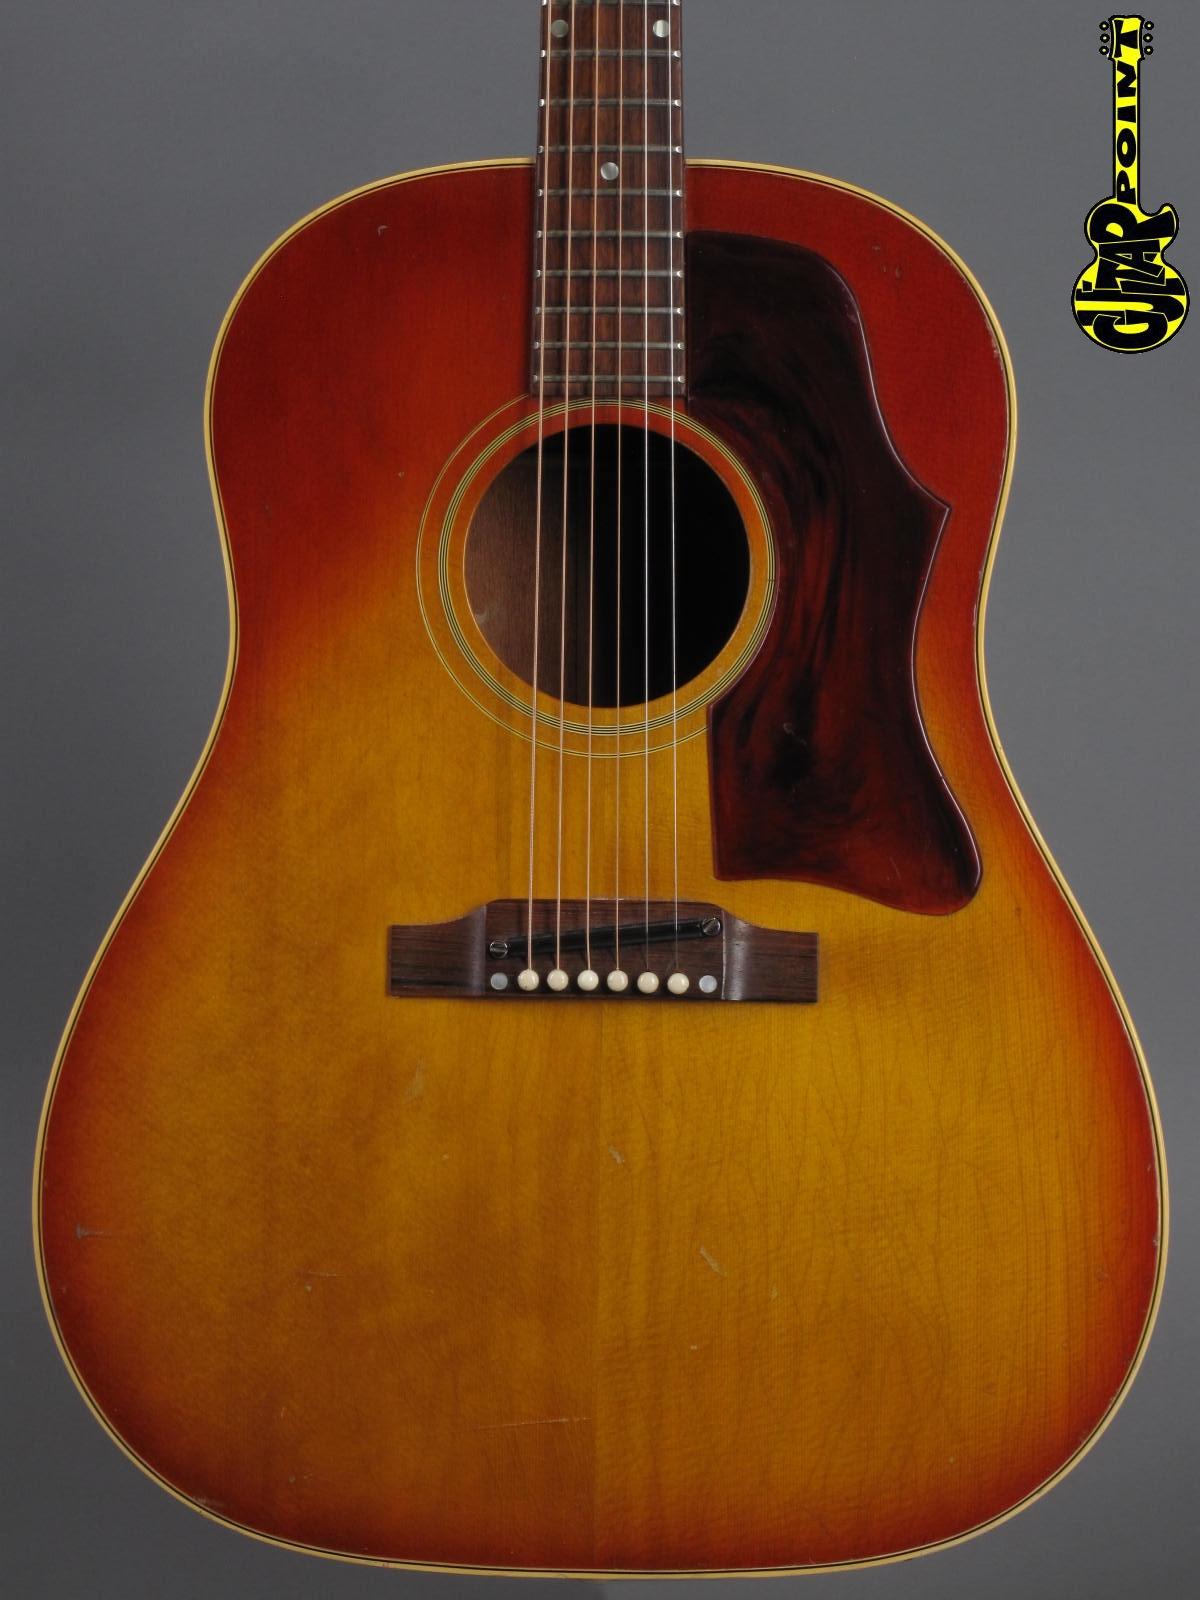 1966 Gibson J-45 - Cherry Sunburst